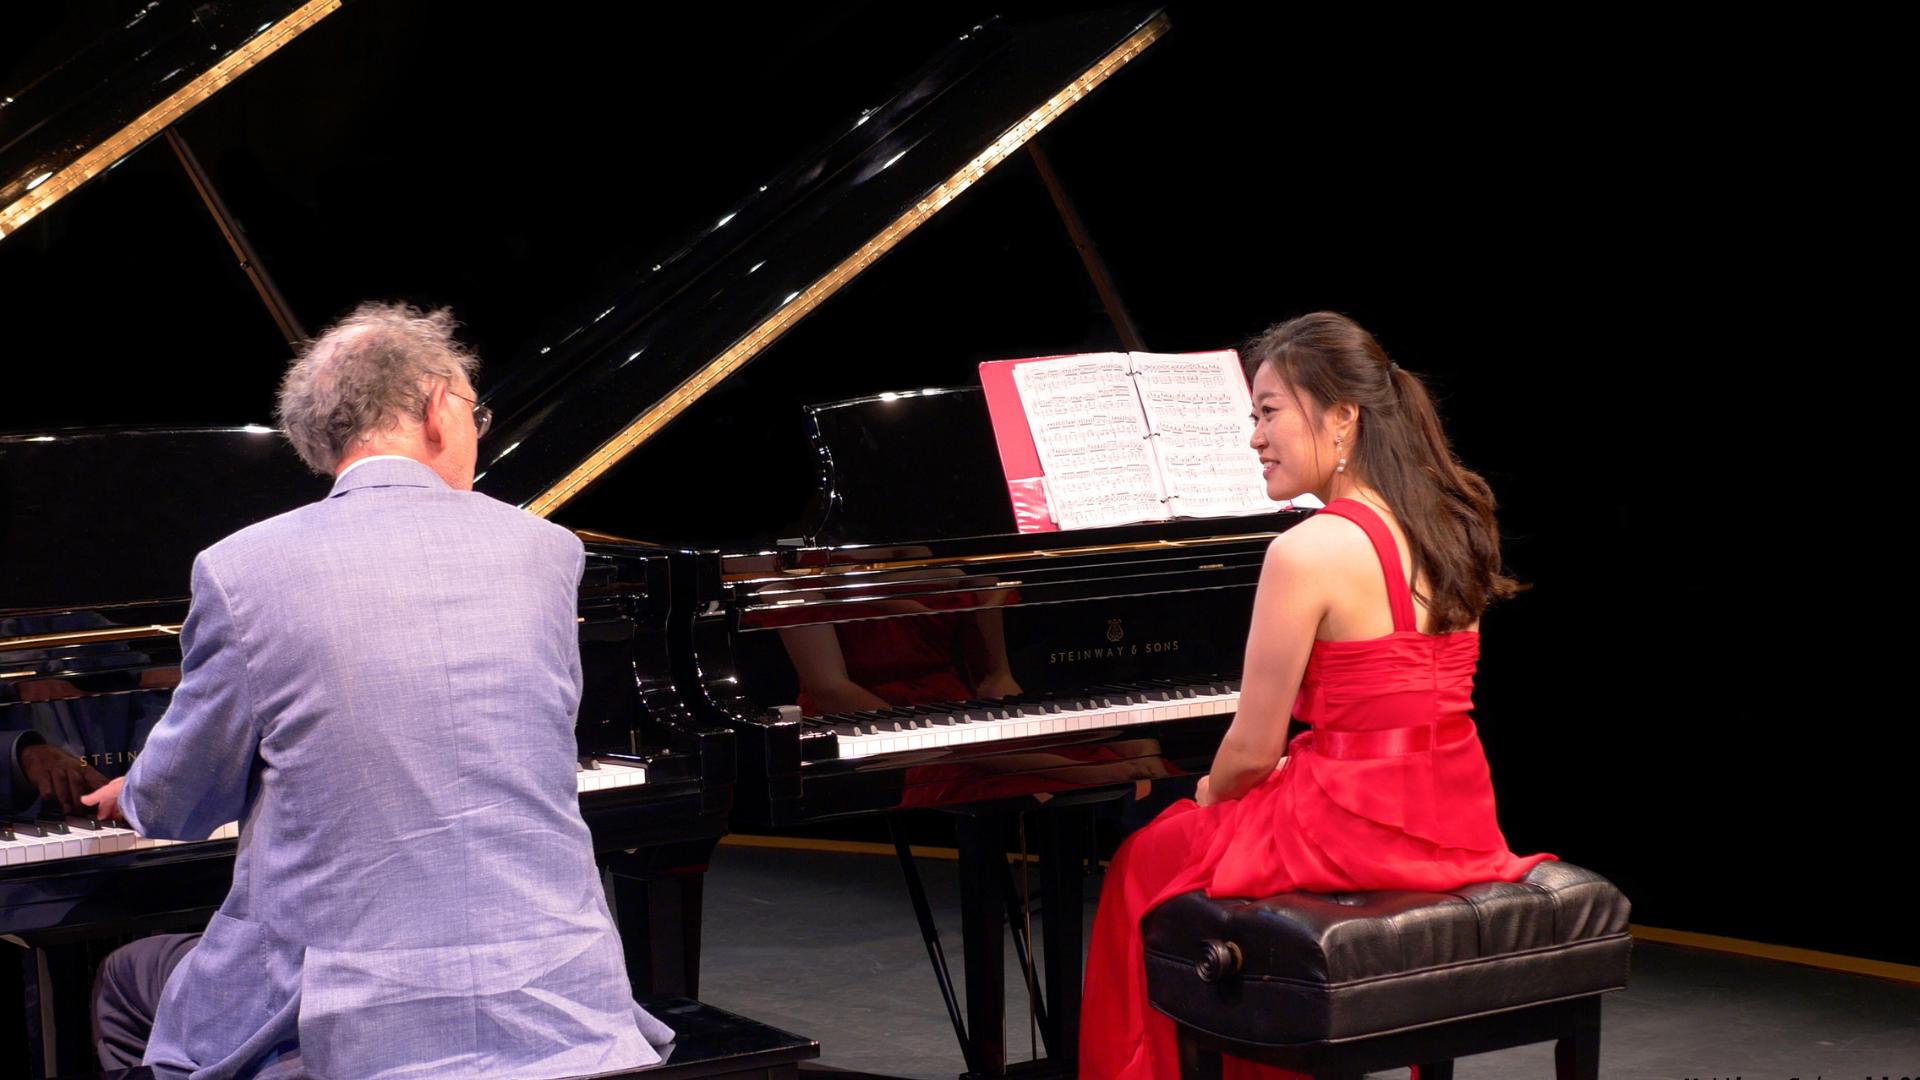 Pianofest in the Hamptons